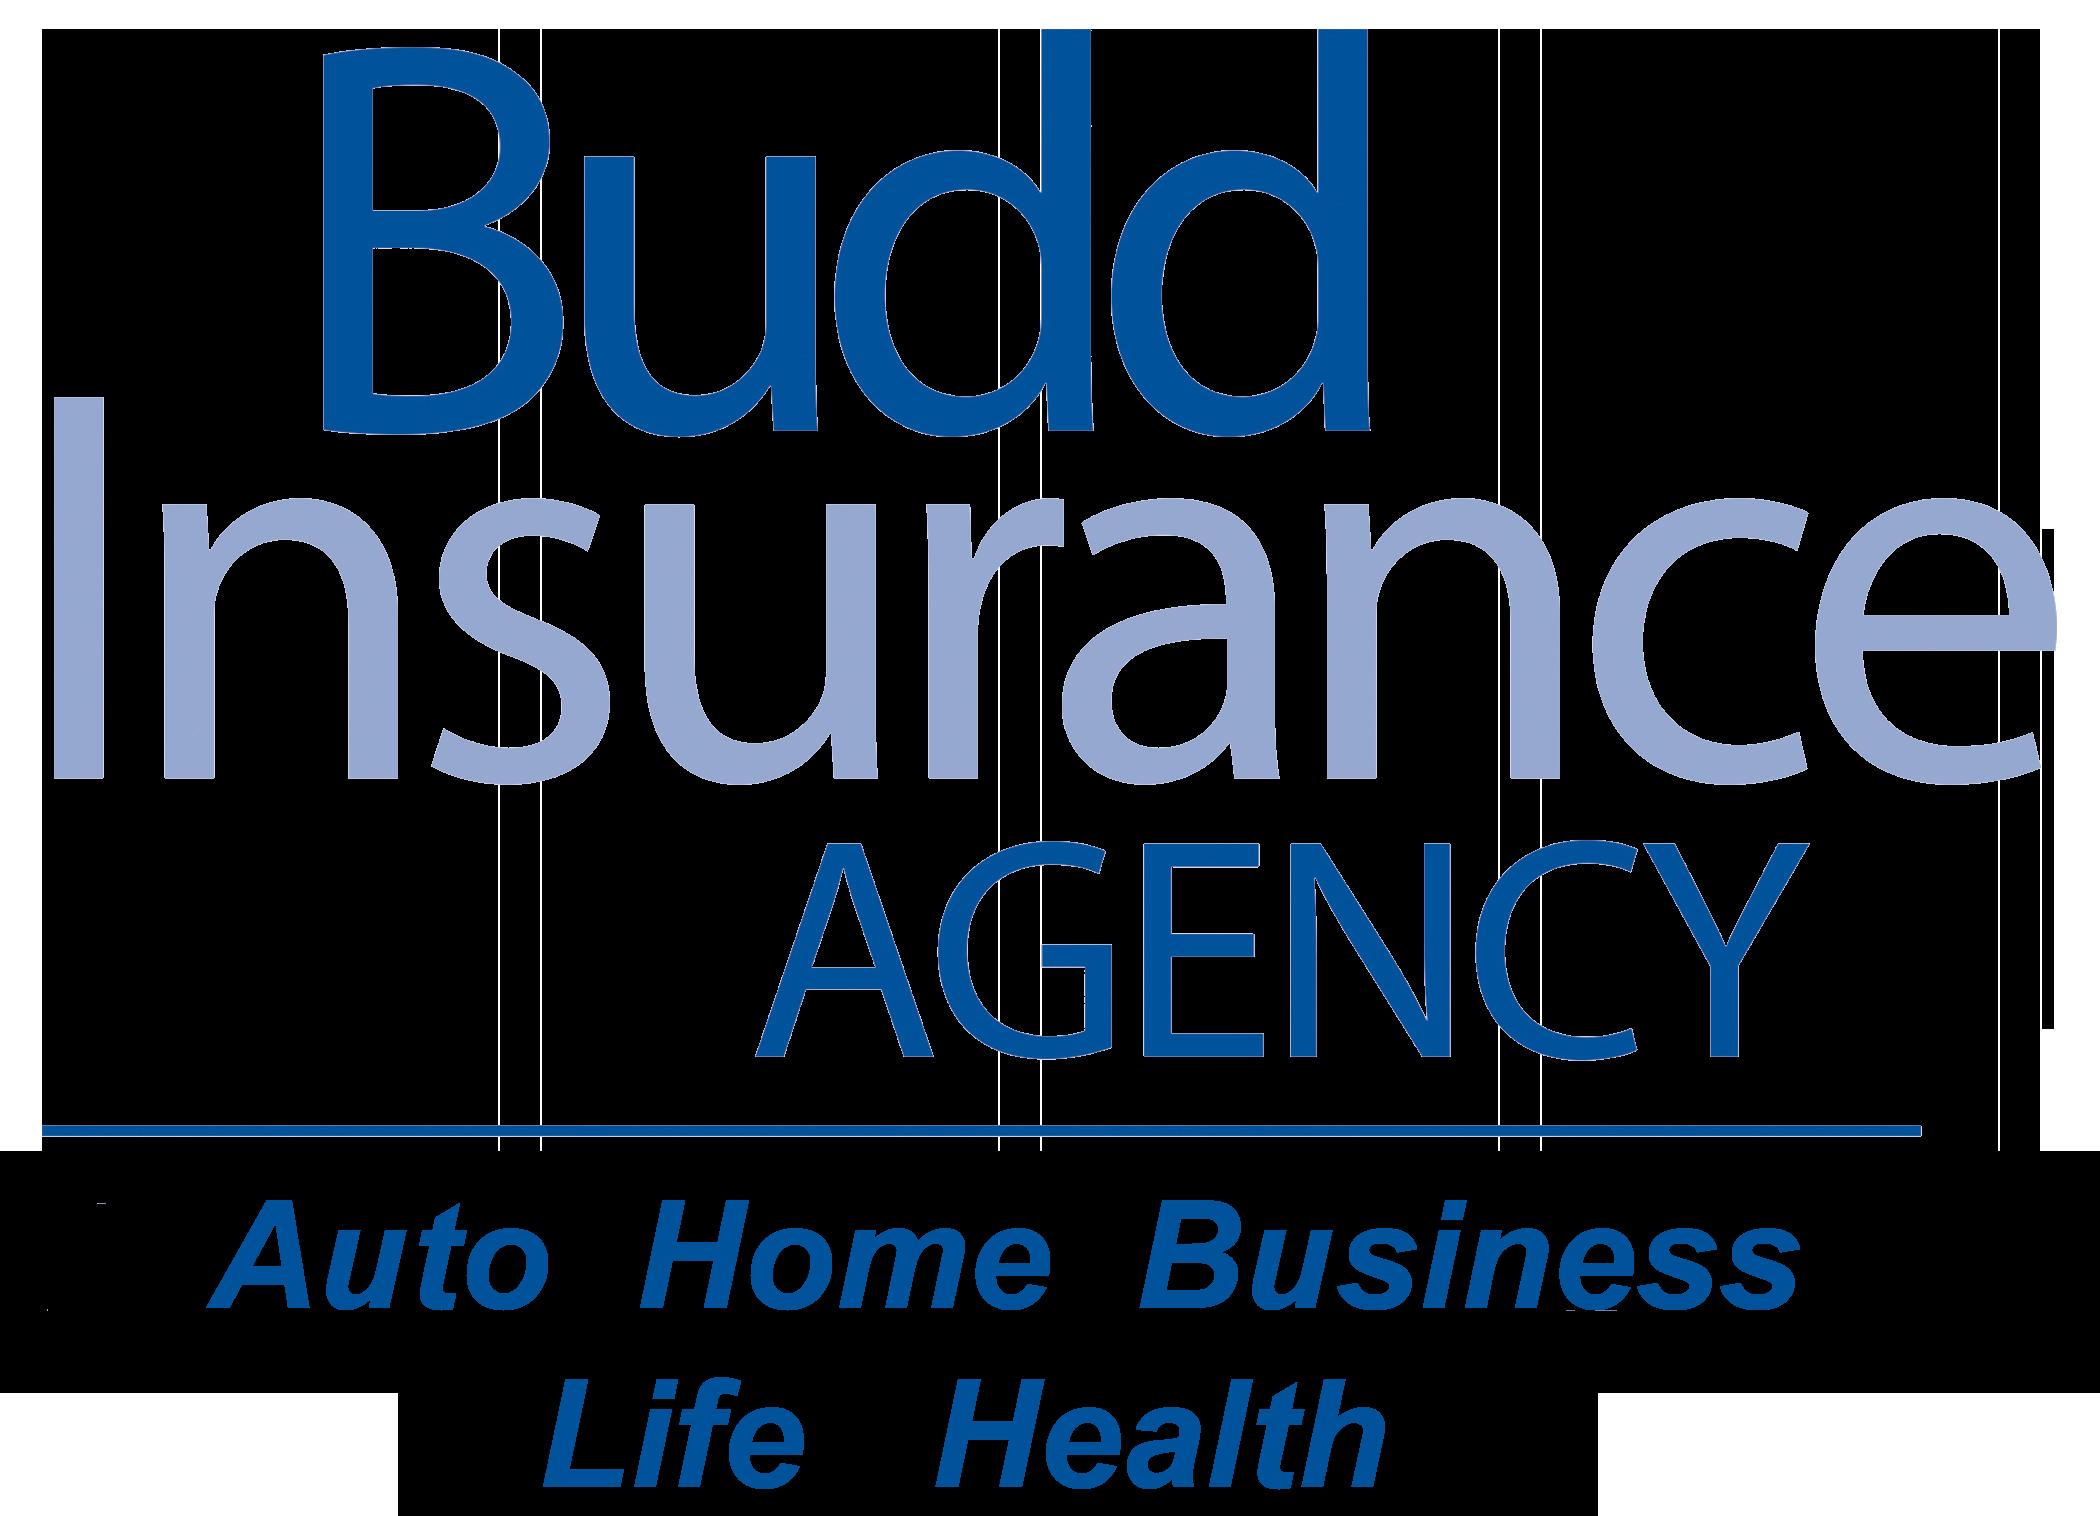 Budd Insurance Agency